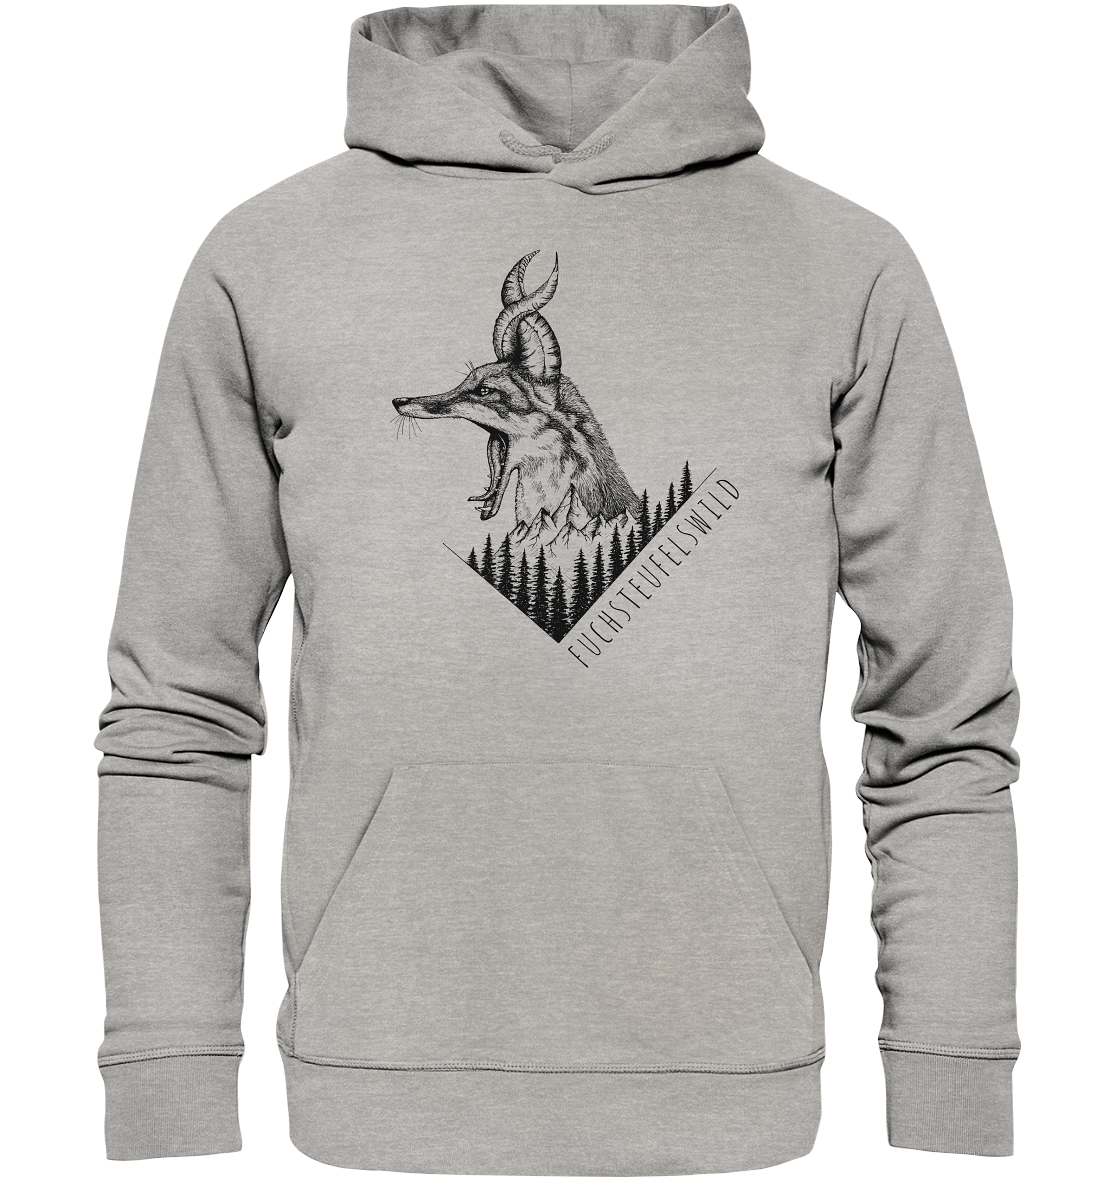 front-organic-hoodie-c2c1c0-1116x-4.png